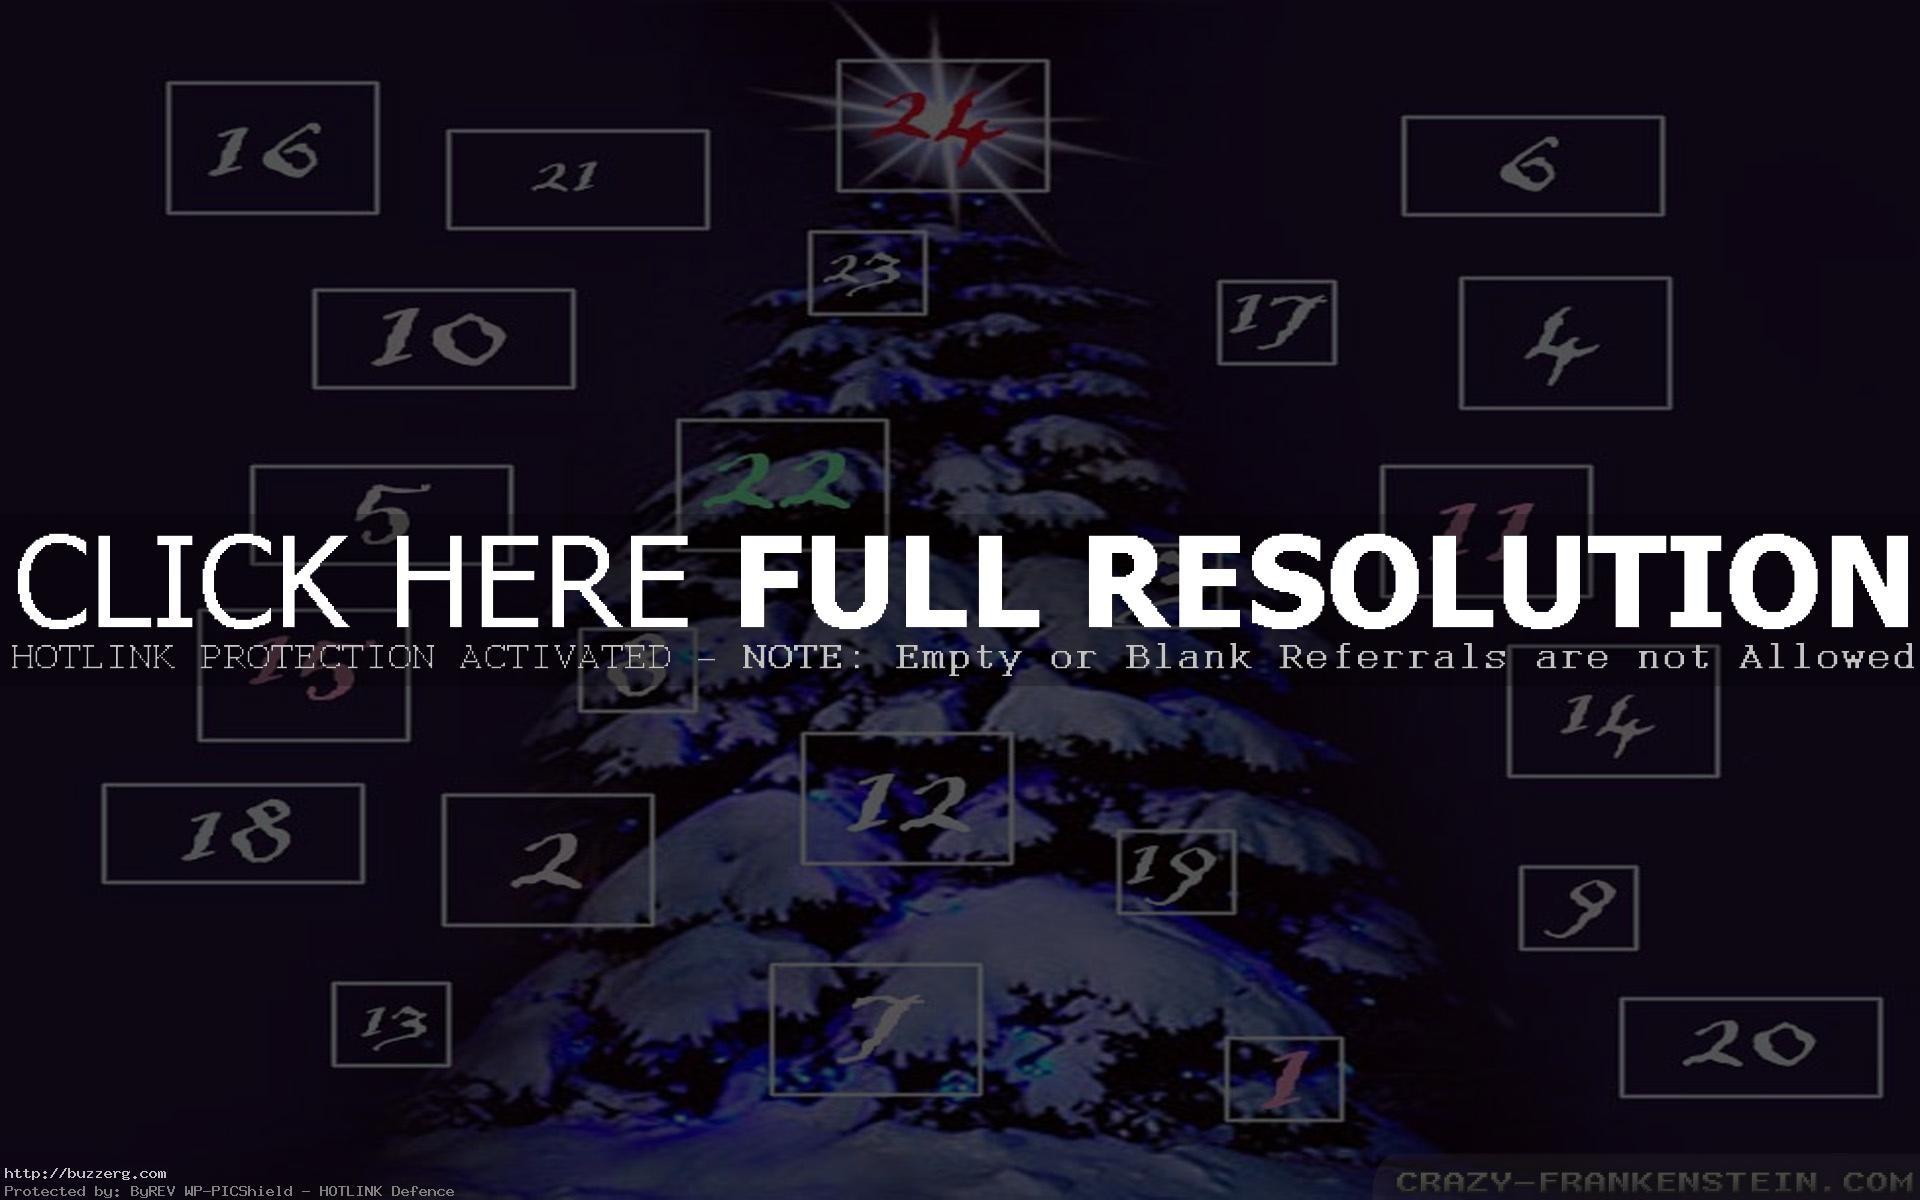 Christmas Countdown Screen Savers.Christmas Countdown Wallpaper 52 Images